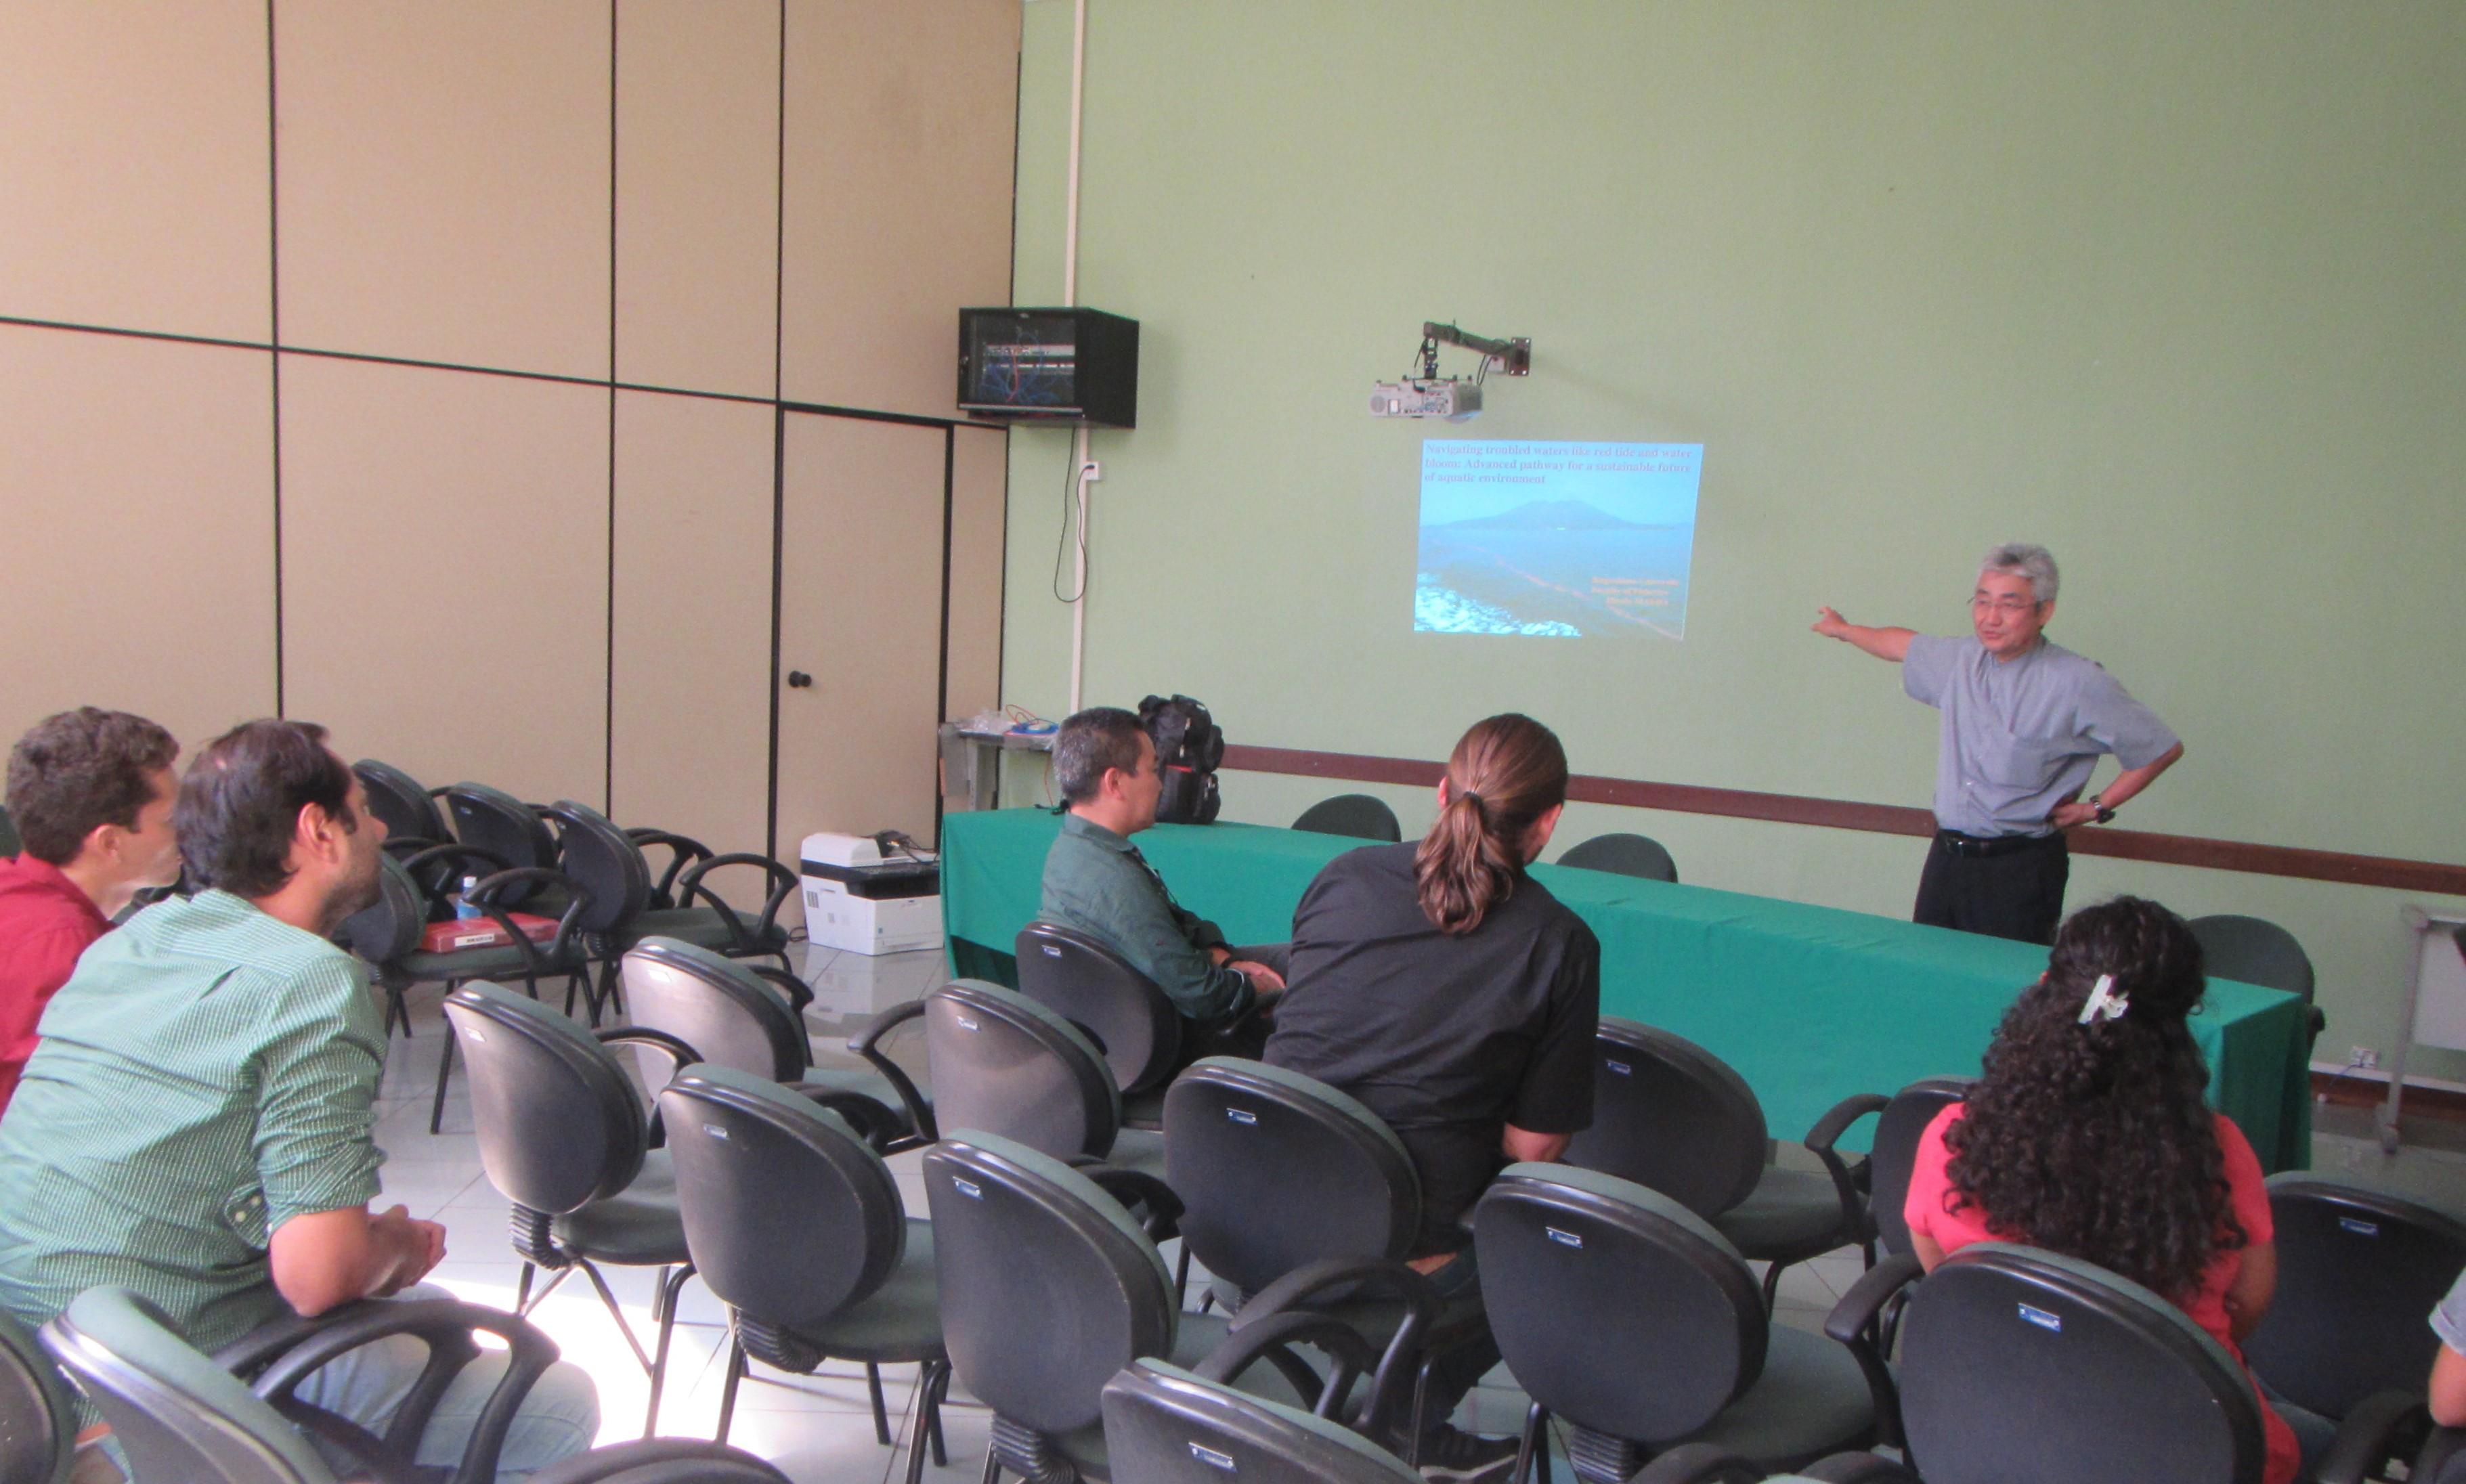 May 2019 Professor Maeda and Assistant Professor Okunishi visited the Amazon University of Agriculture and Agriculture: UFRA (Universidade Federal Rural Da Amazônia)